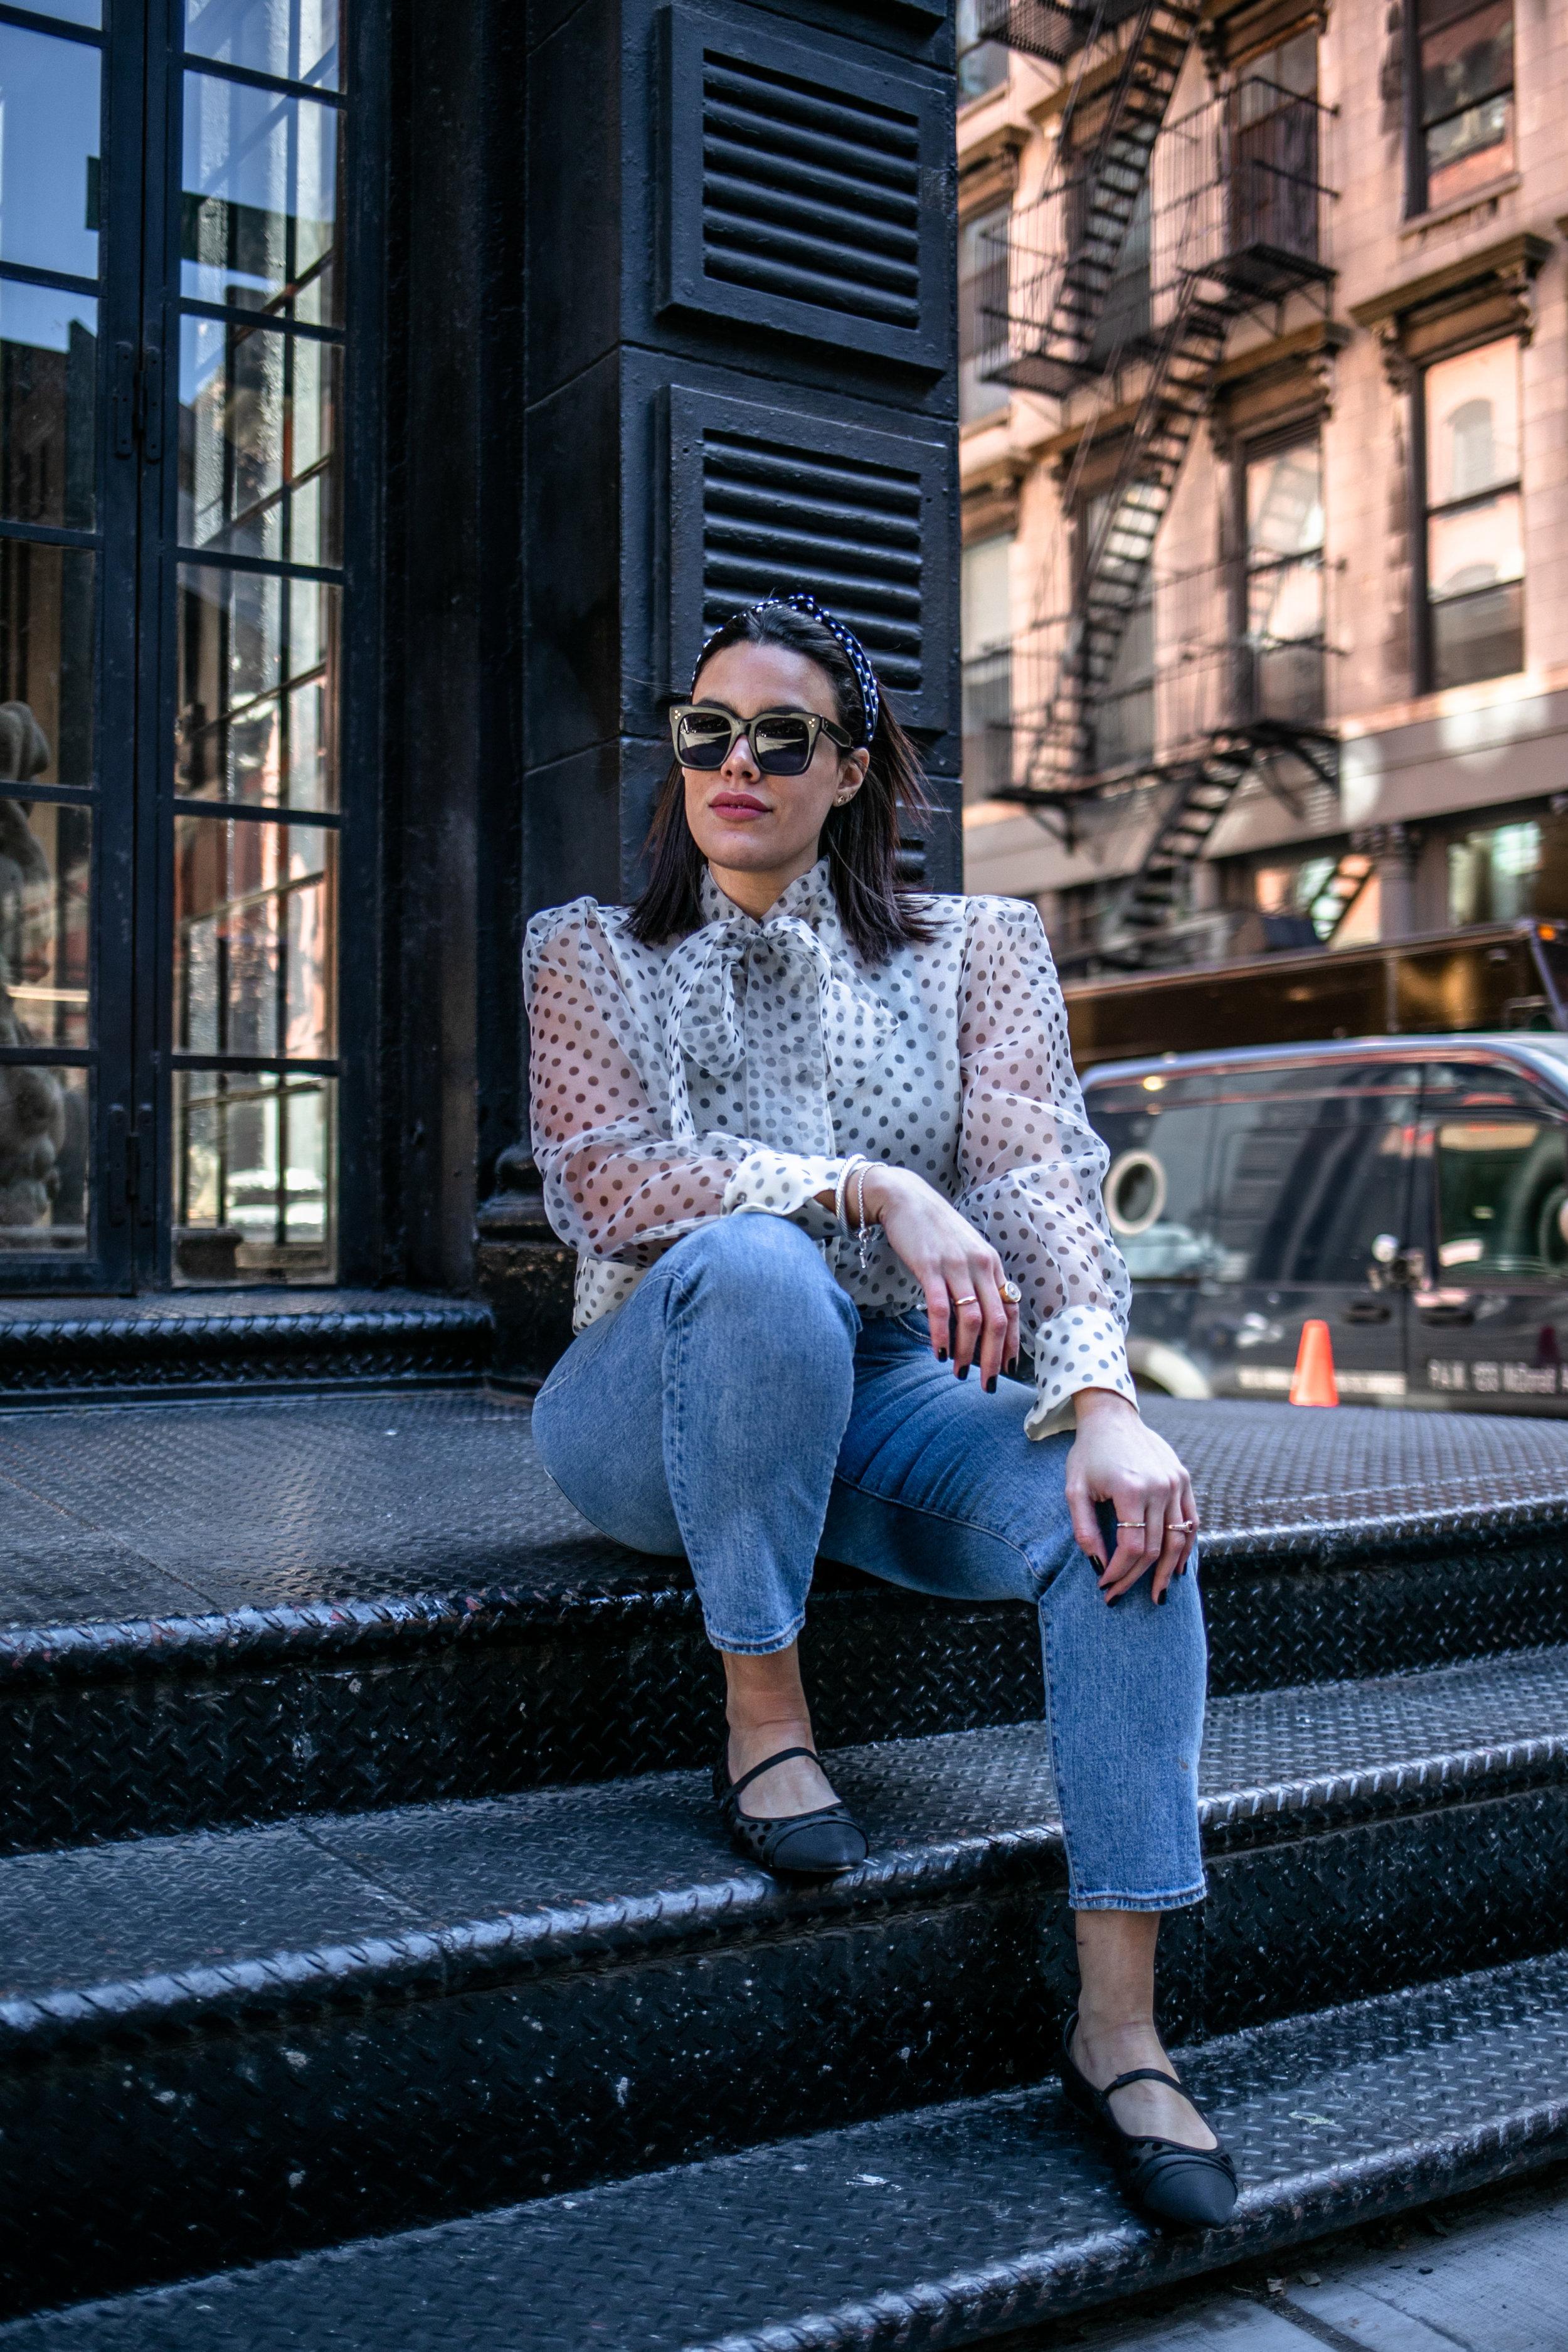 how-to-style-zara-sheer-polka-dot-organza-blouse-latina-new-york-city-fashion-blogger-style-operator-spring-fashion.jpg